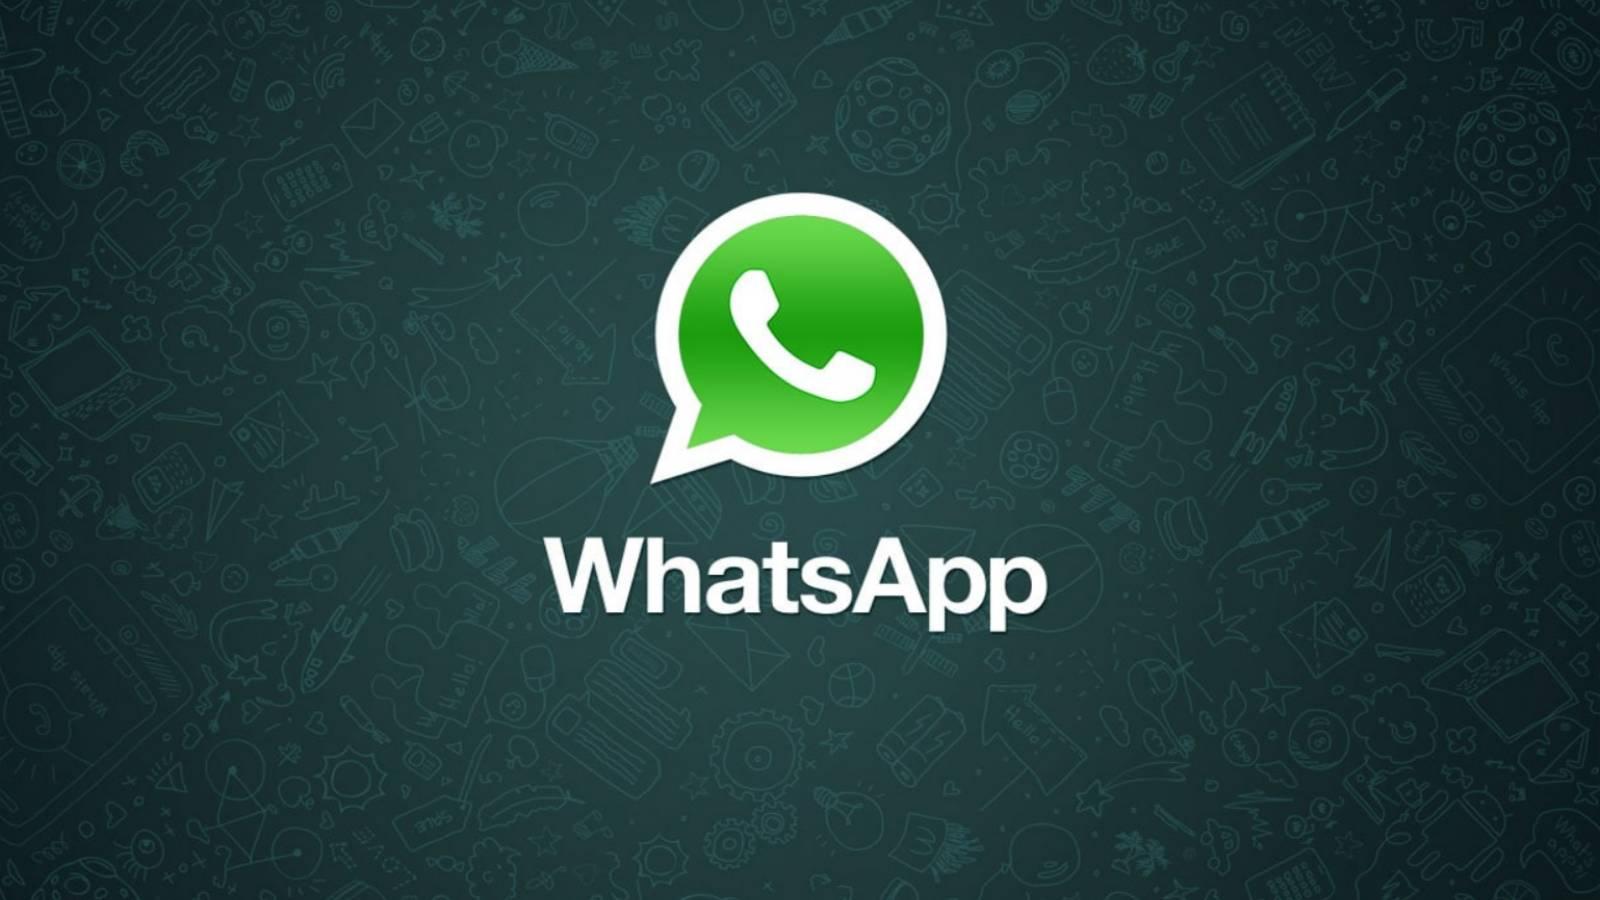 WhatsApp improspatare